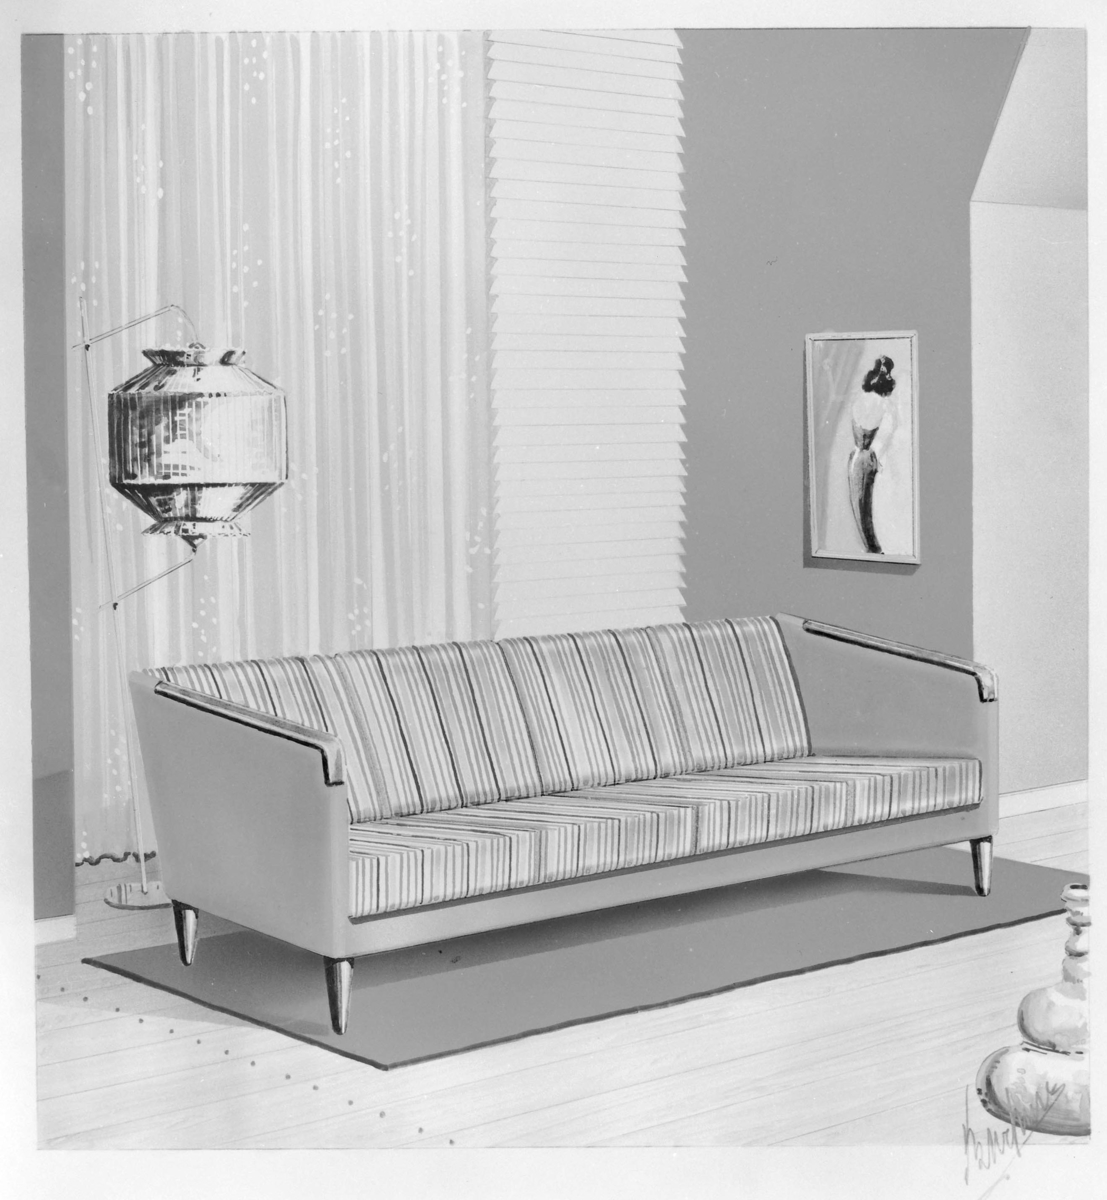 Skisse/teikning av sofa.